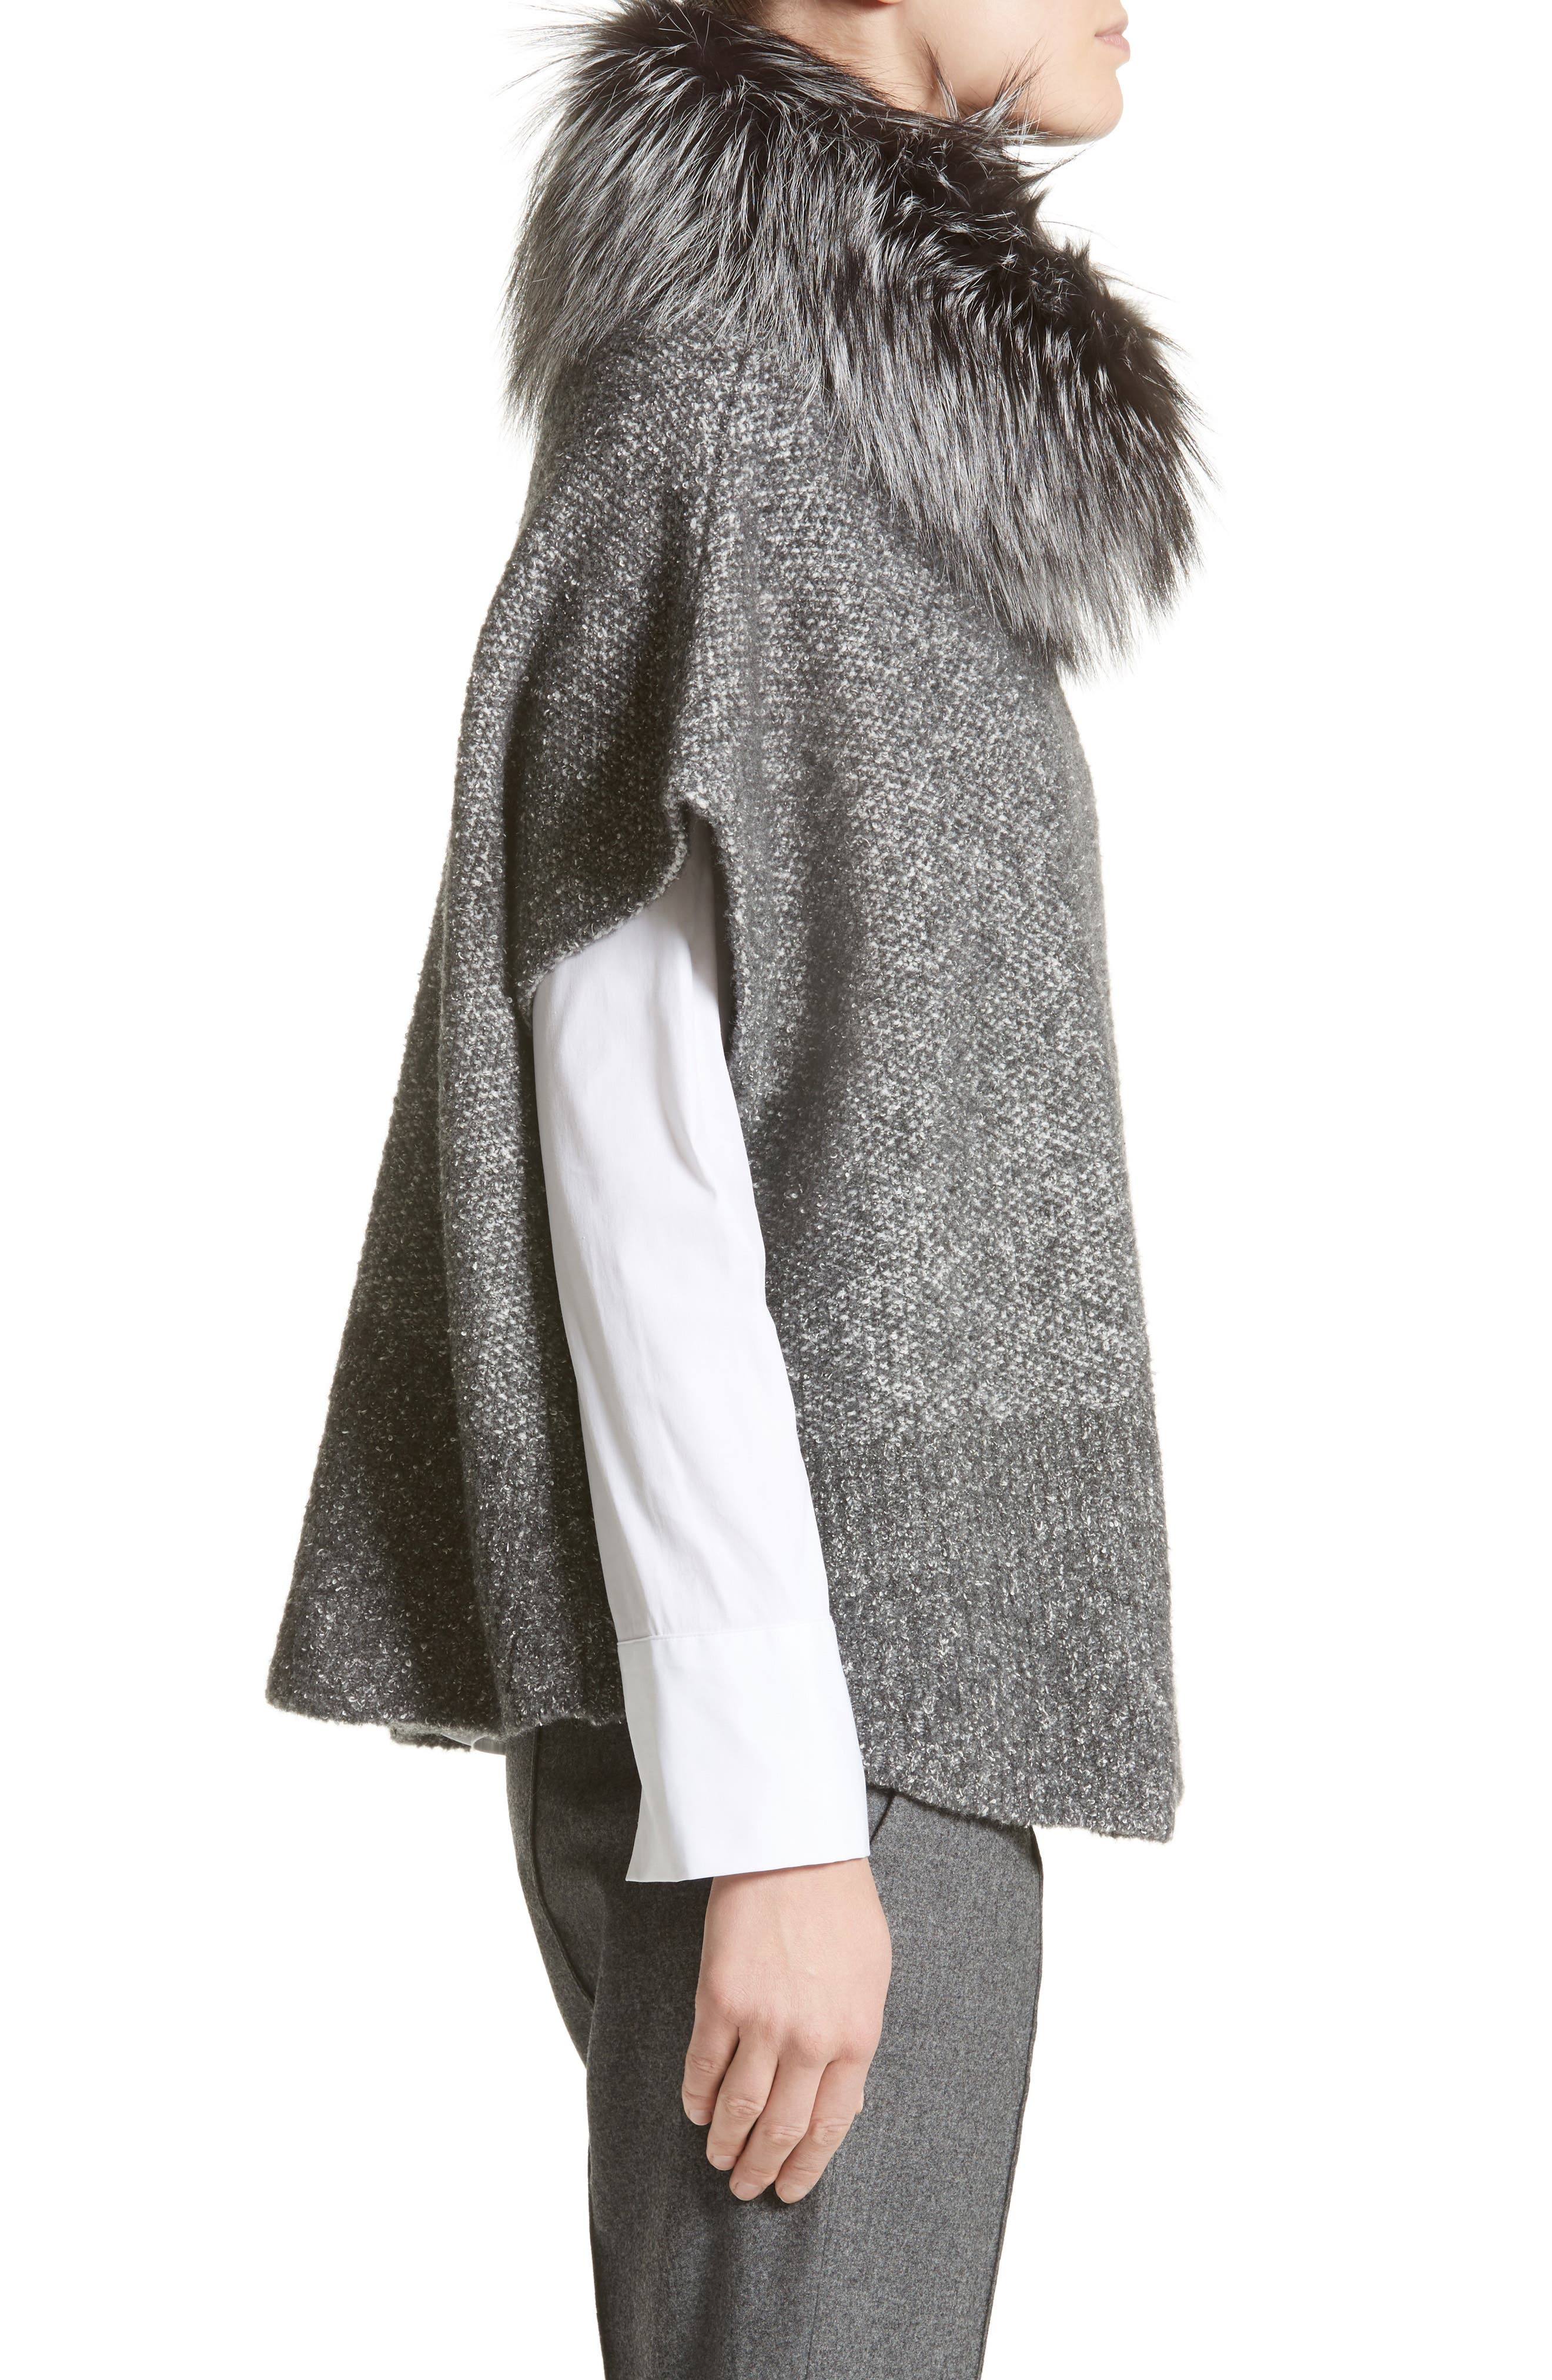 Pebble Tweed Knit Poncho with Genuine Fox Fur Collar,                             Alternate thumbnail 6, color,                             Grey Multi